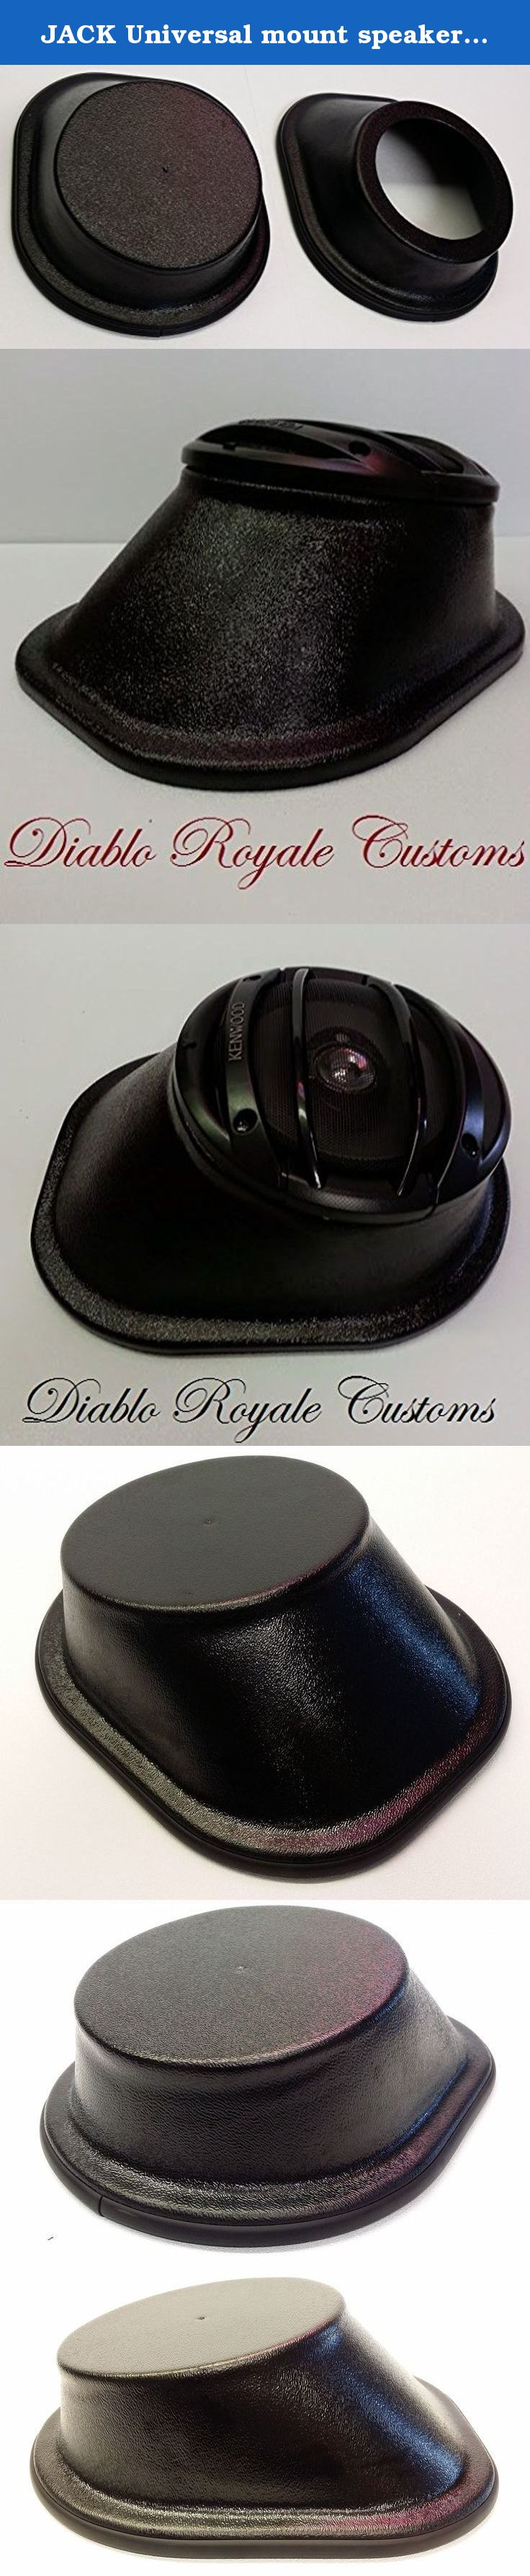 Jack Universal Mount Speaker pod Custom car Audio enclosureMADE in The USA